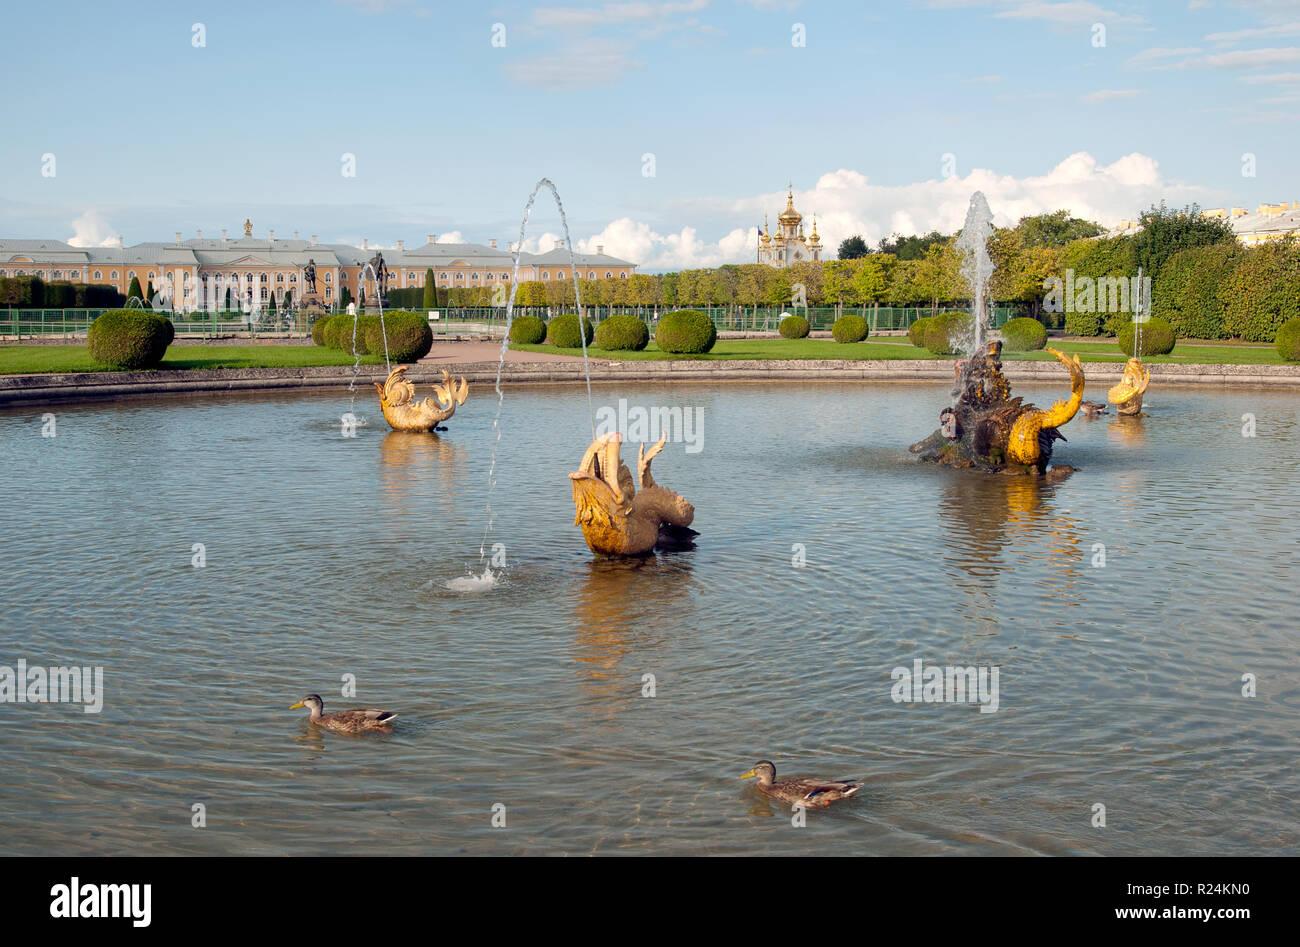 PETERHOF, SAINT-PETERSBURG, RUSSIA - SEPTEMBER 2, 2018: The Upper Garden. Ducks swim in The Mezheumniy (Indefinite) Fountain. - Stock Photo